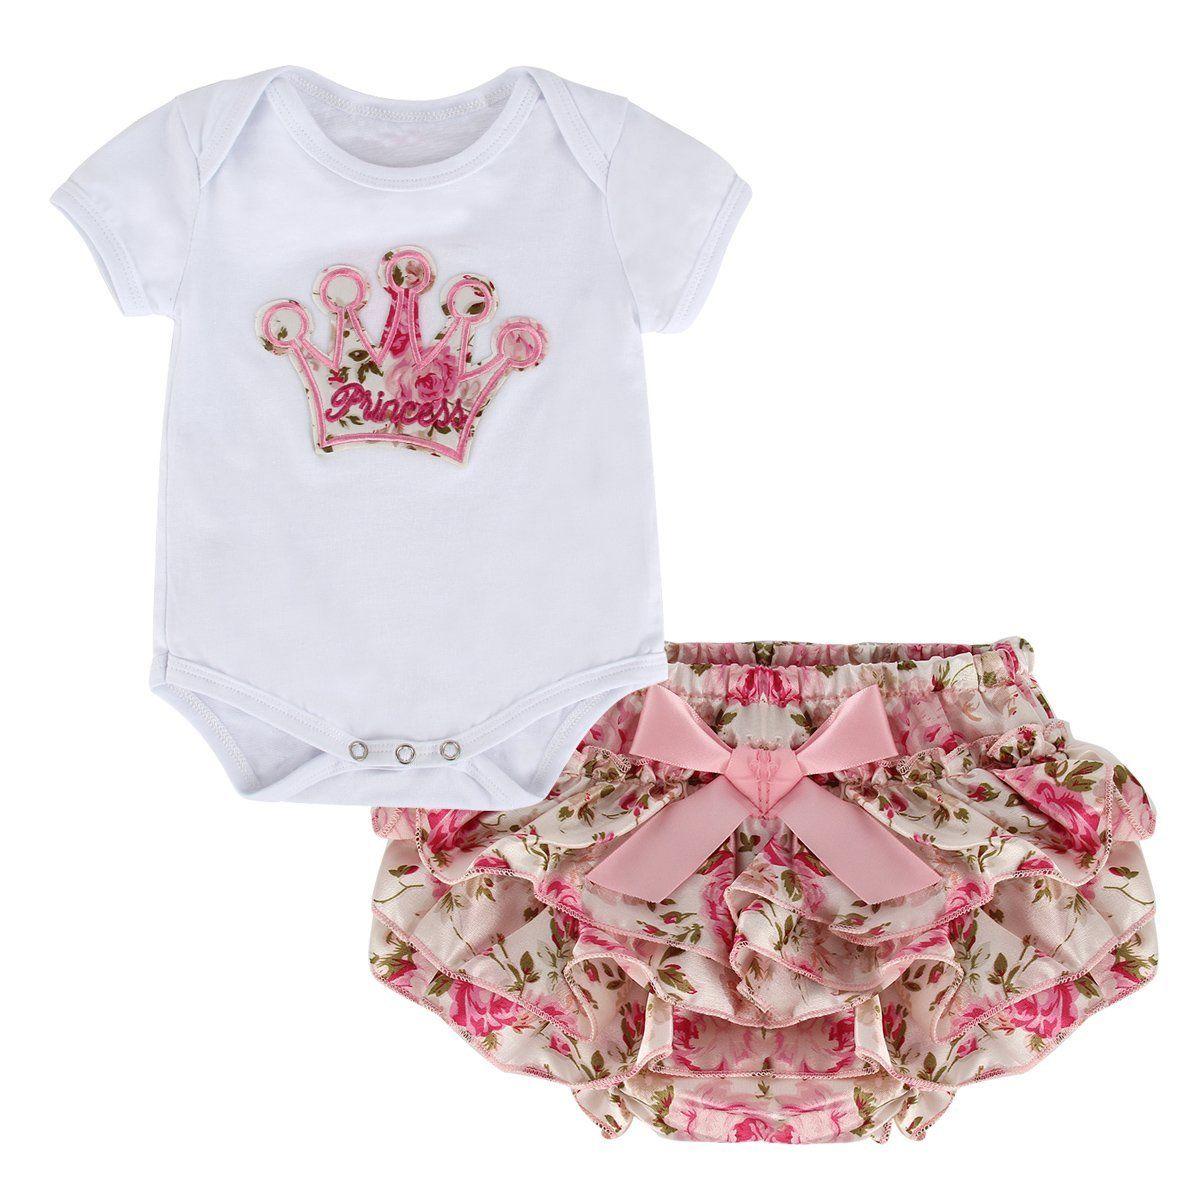 Toddler Kids Baby Girls Romper Tops Floral Short Skirt Dress Outfits Clothes Set